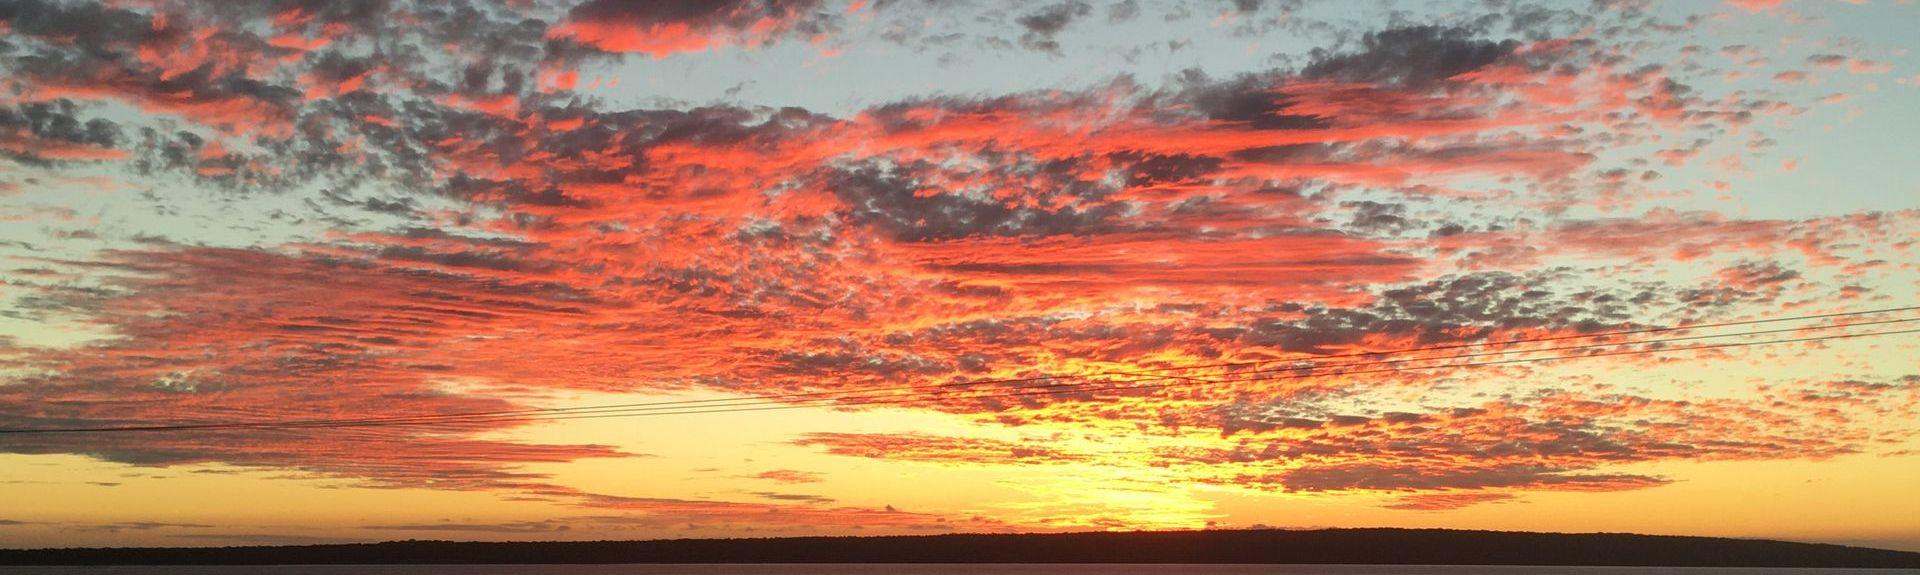 Bass Coast Shire, VIC, Australia